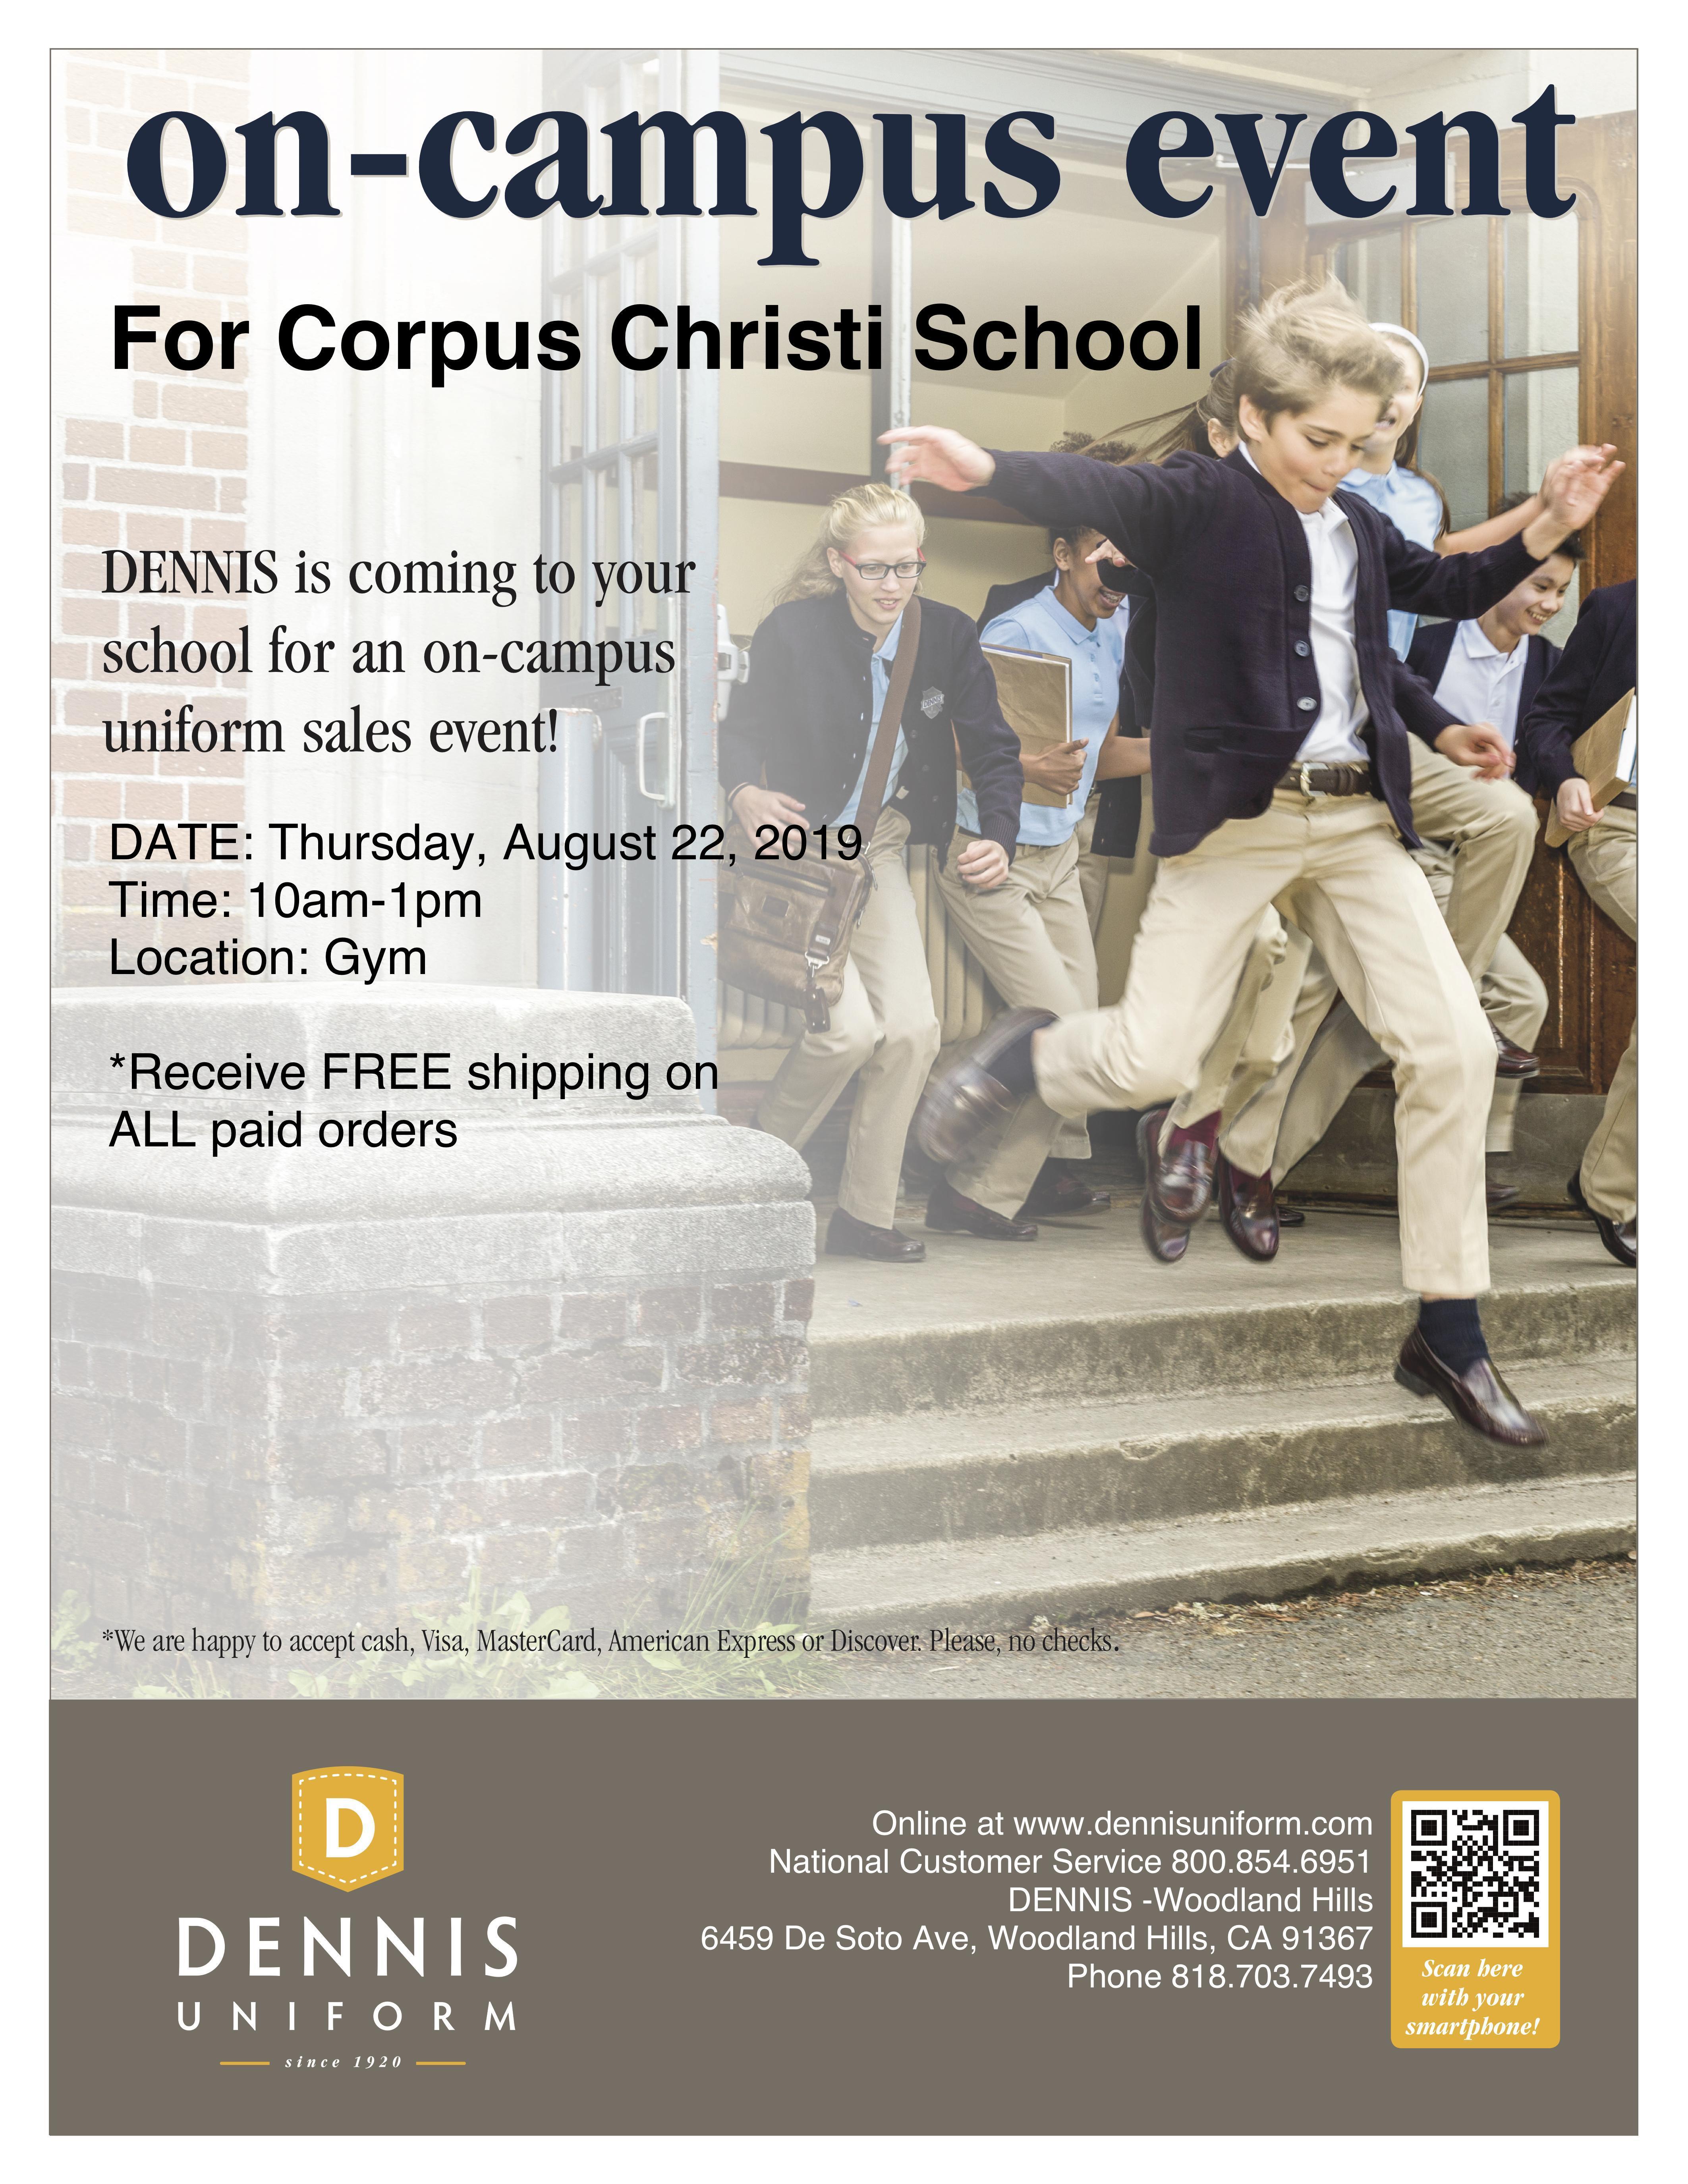 Dennis Uniform Sale on Campus! Image